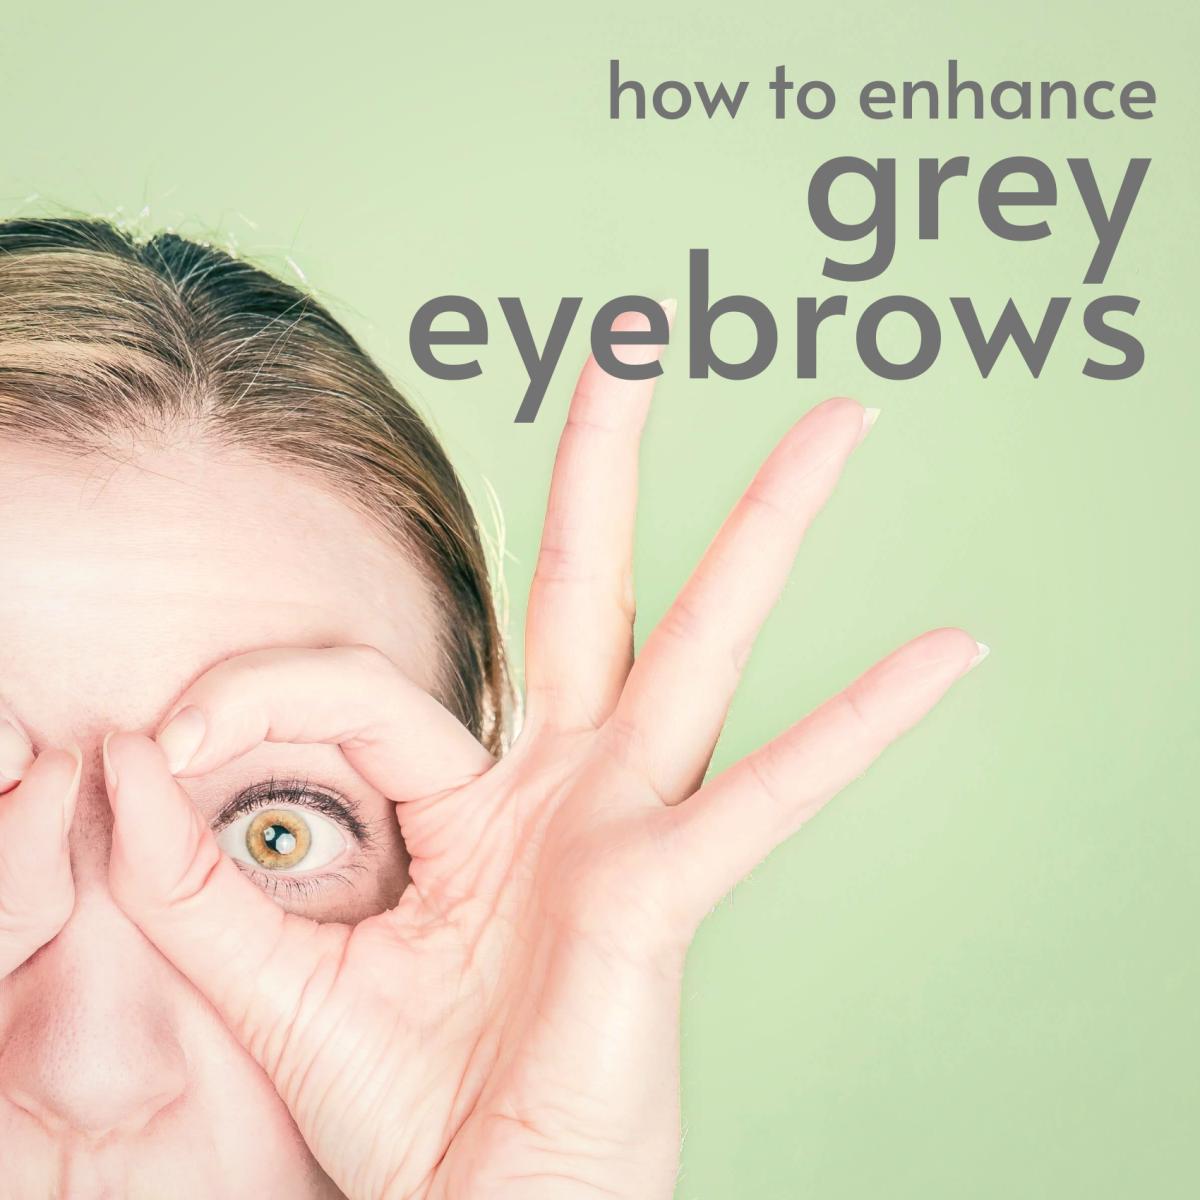 Eyebrow pencils and makeup options for gray hair.